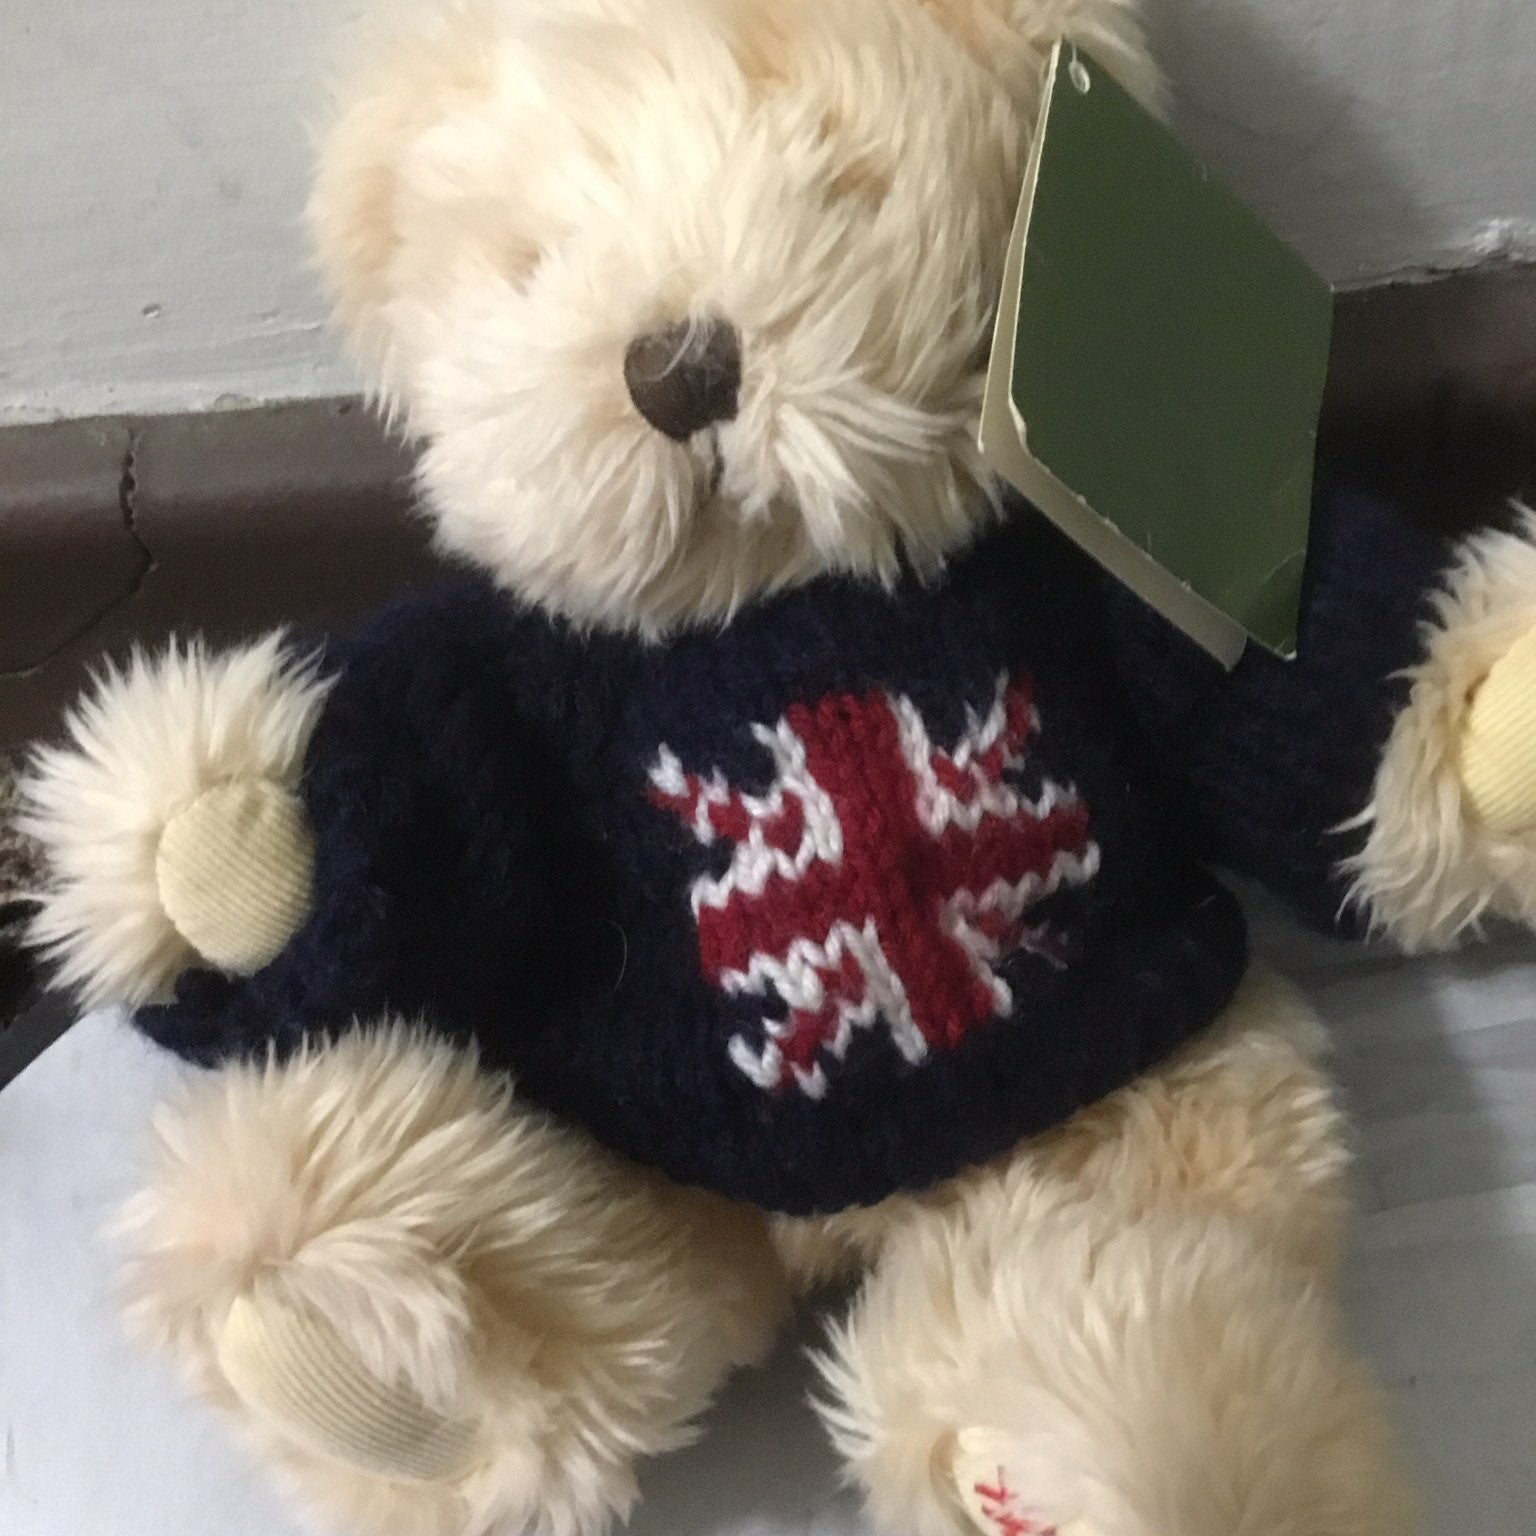 Harrods union jack plush bear